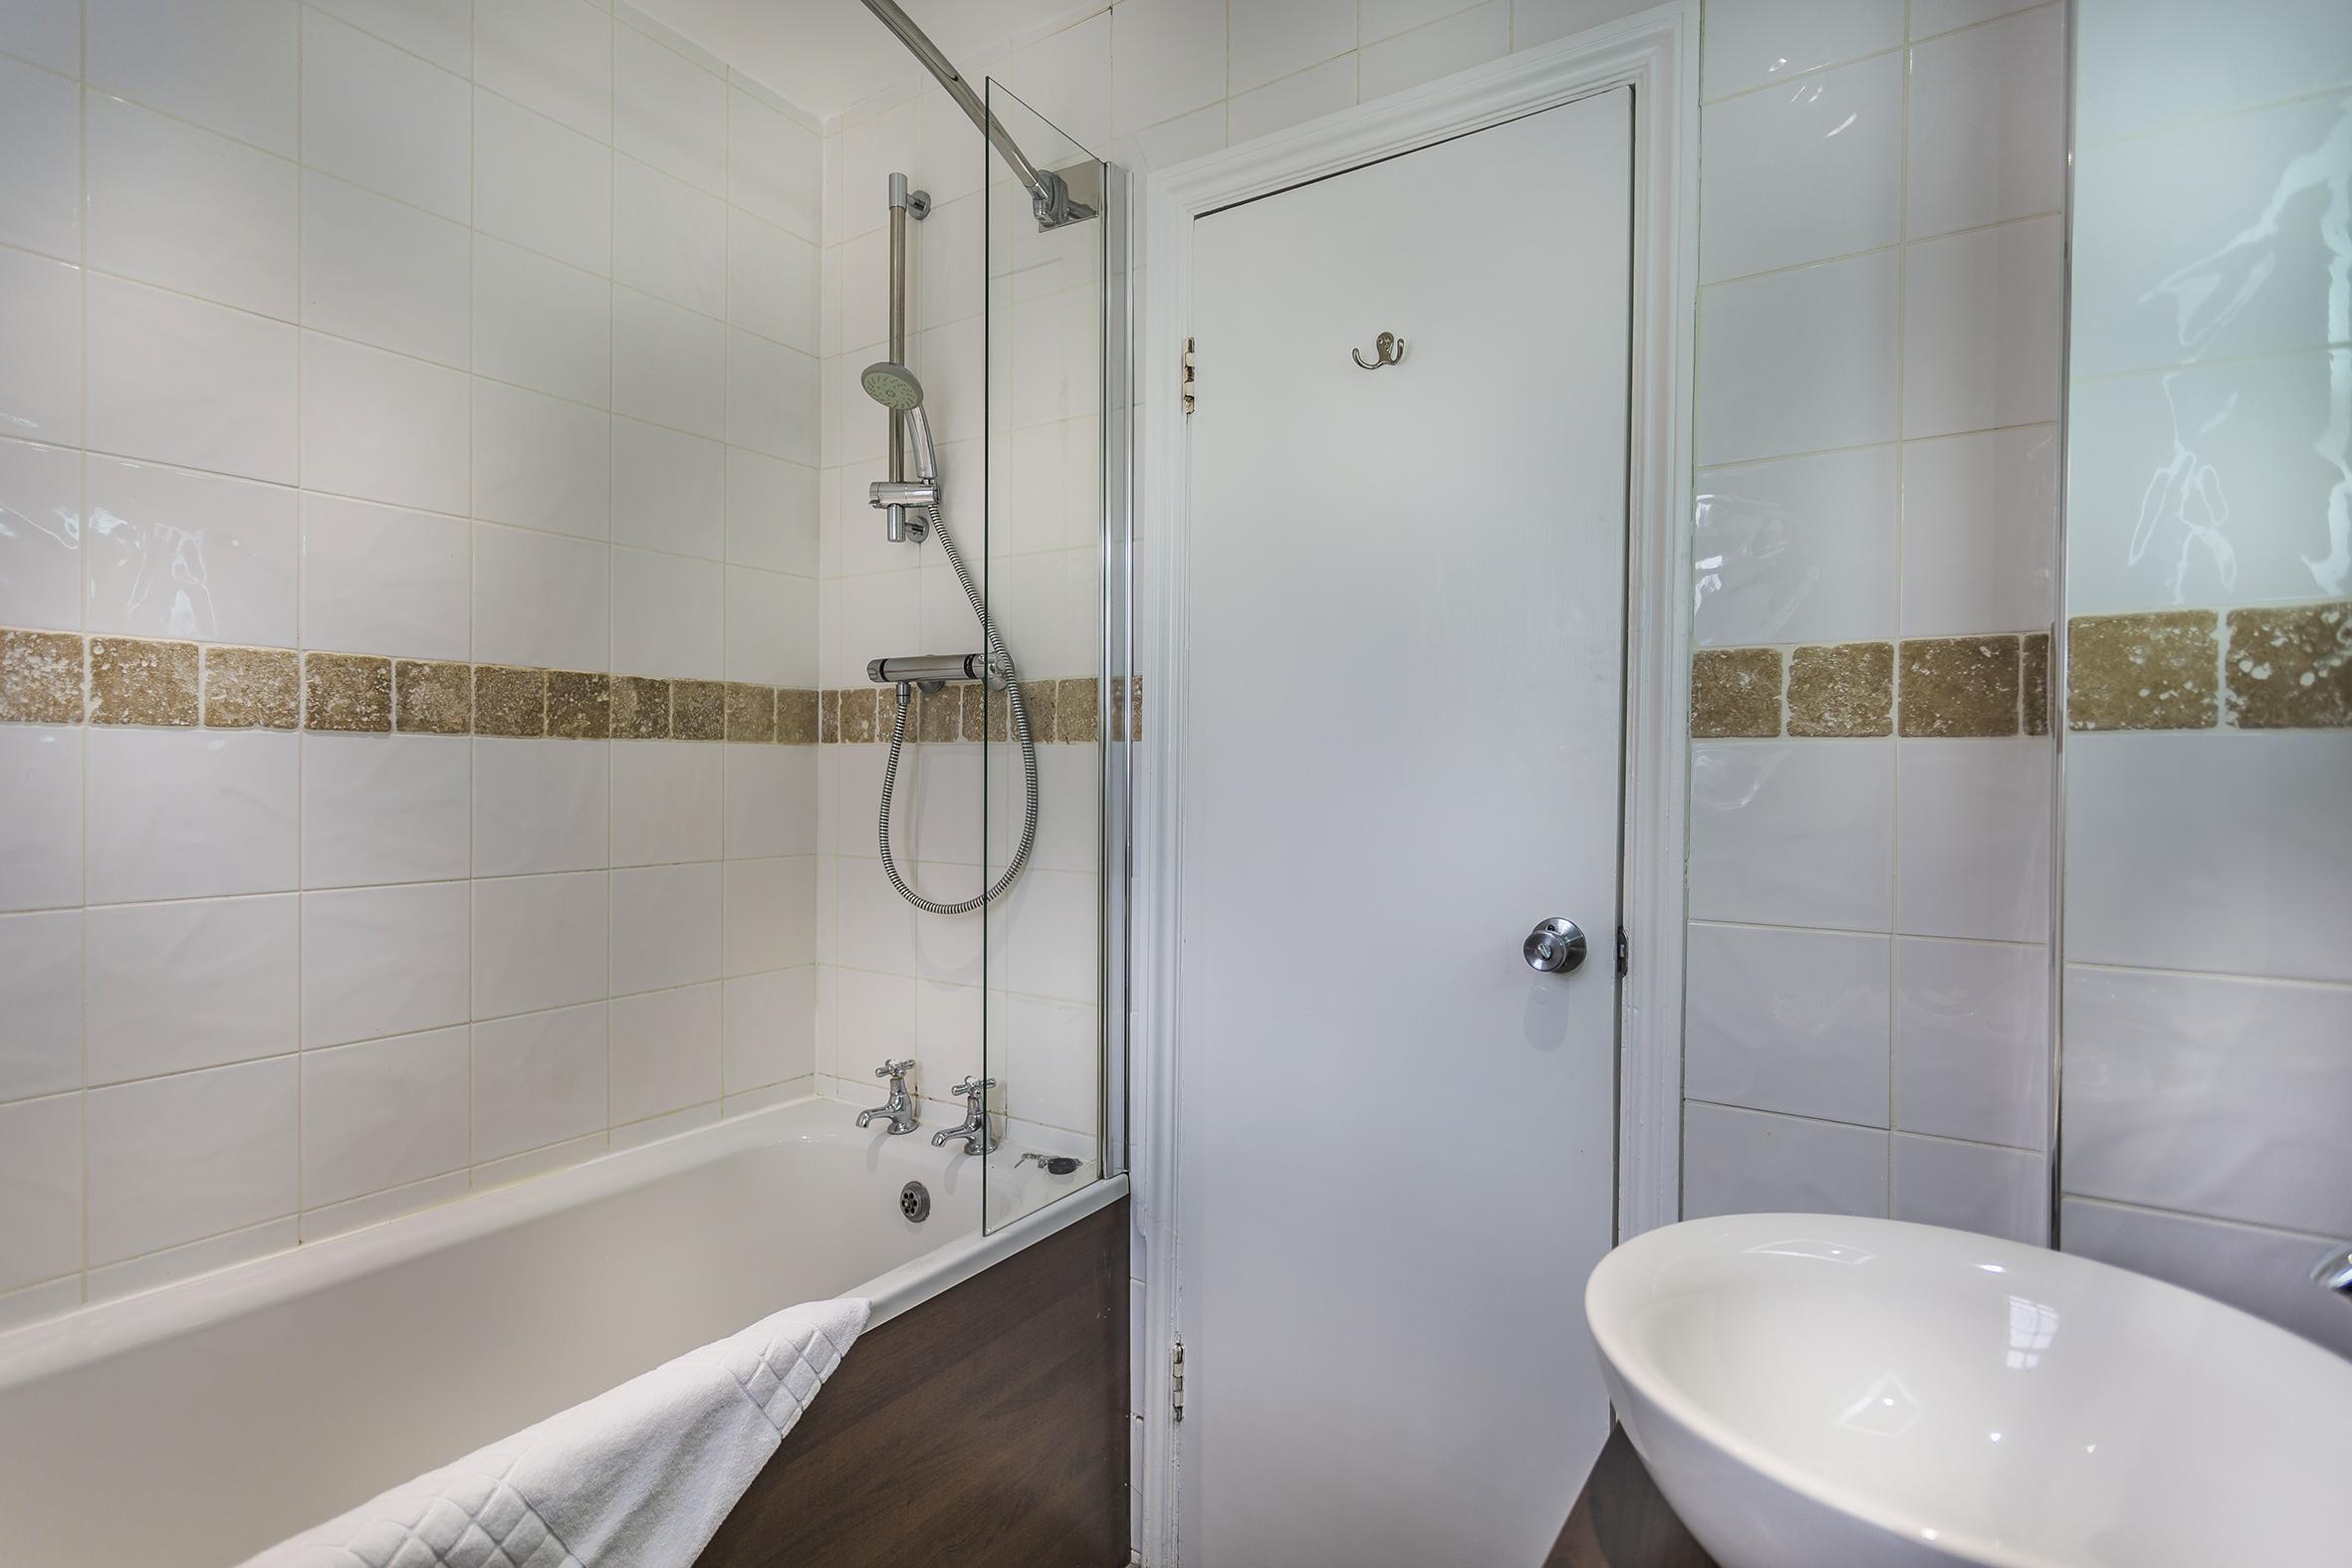 WhiteHartRoyal_Room_114_Bathroom.jpg